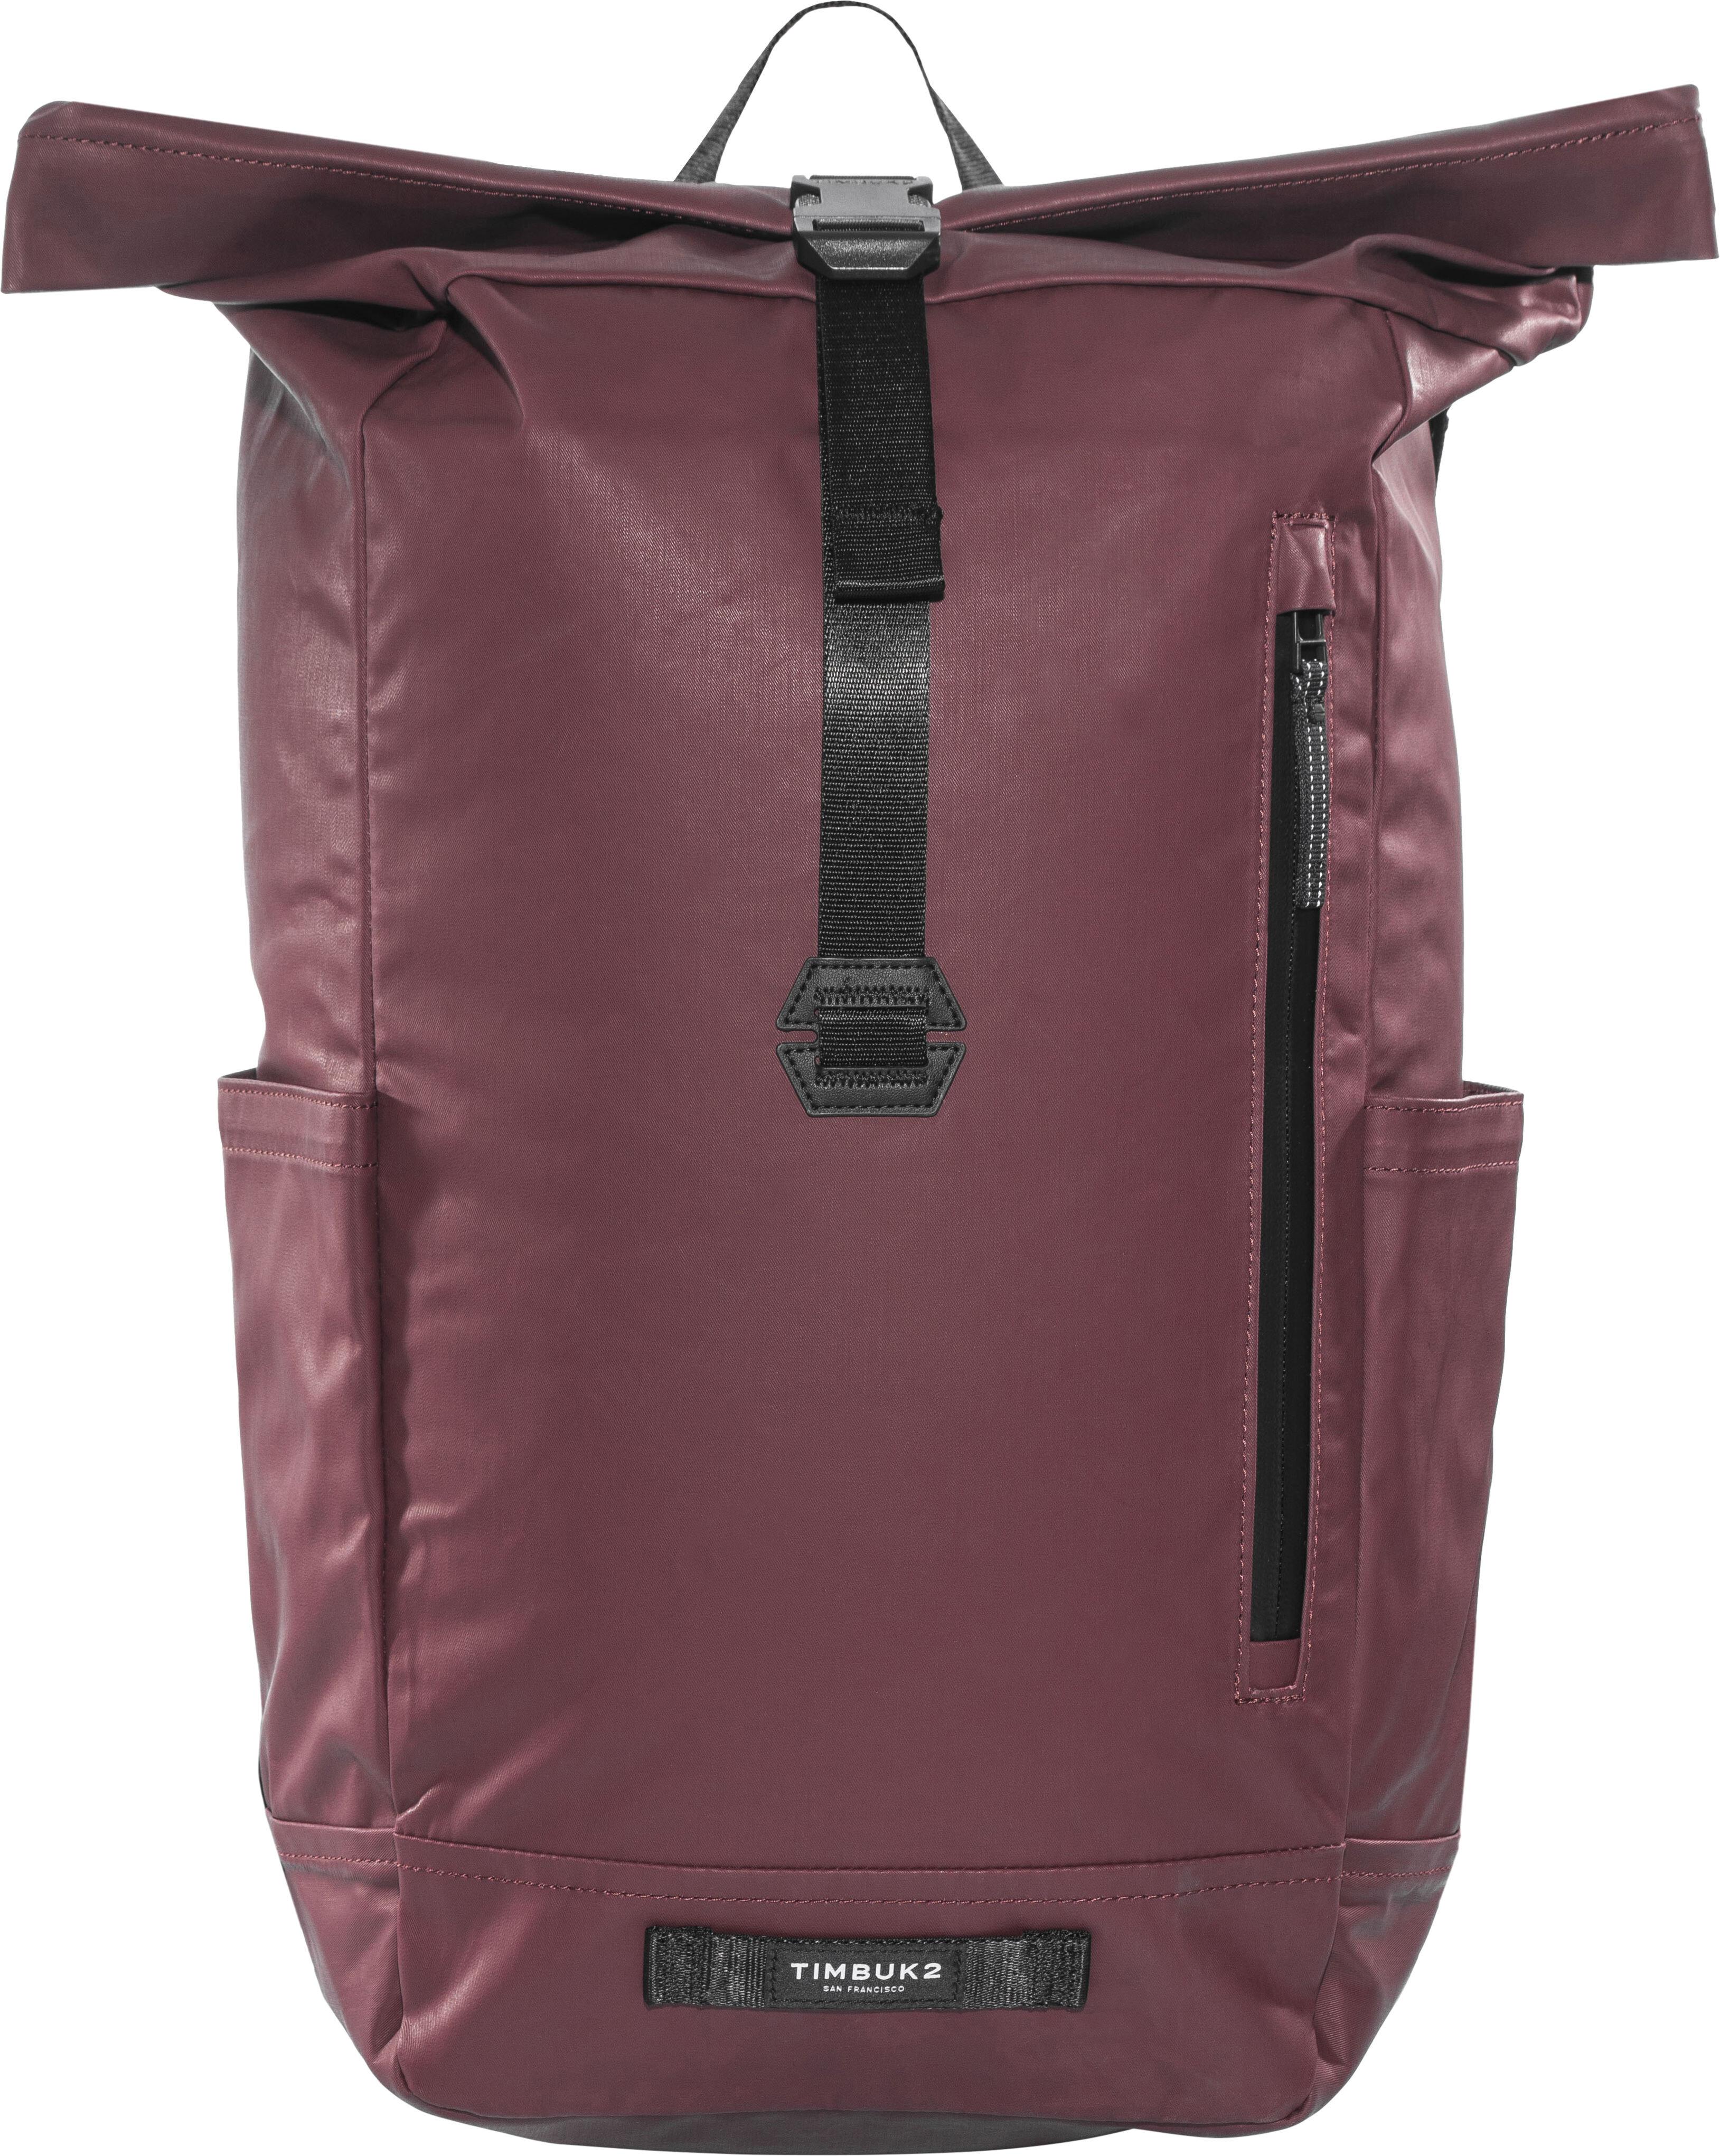 Timbuk2 Tuck Pack Carbon Coated Backpack red at Bikester.co.uk 7d83b40de19d1